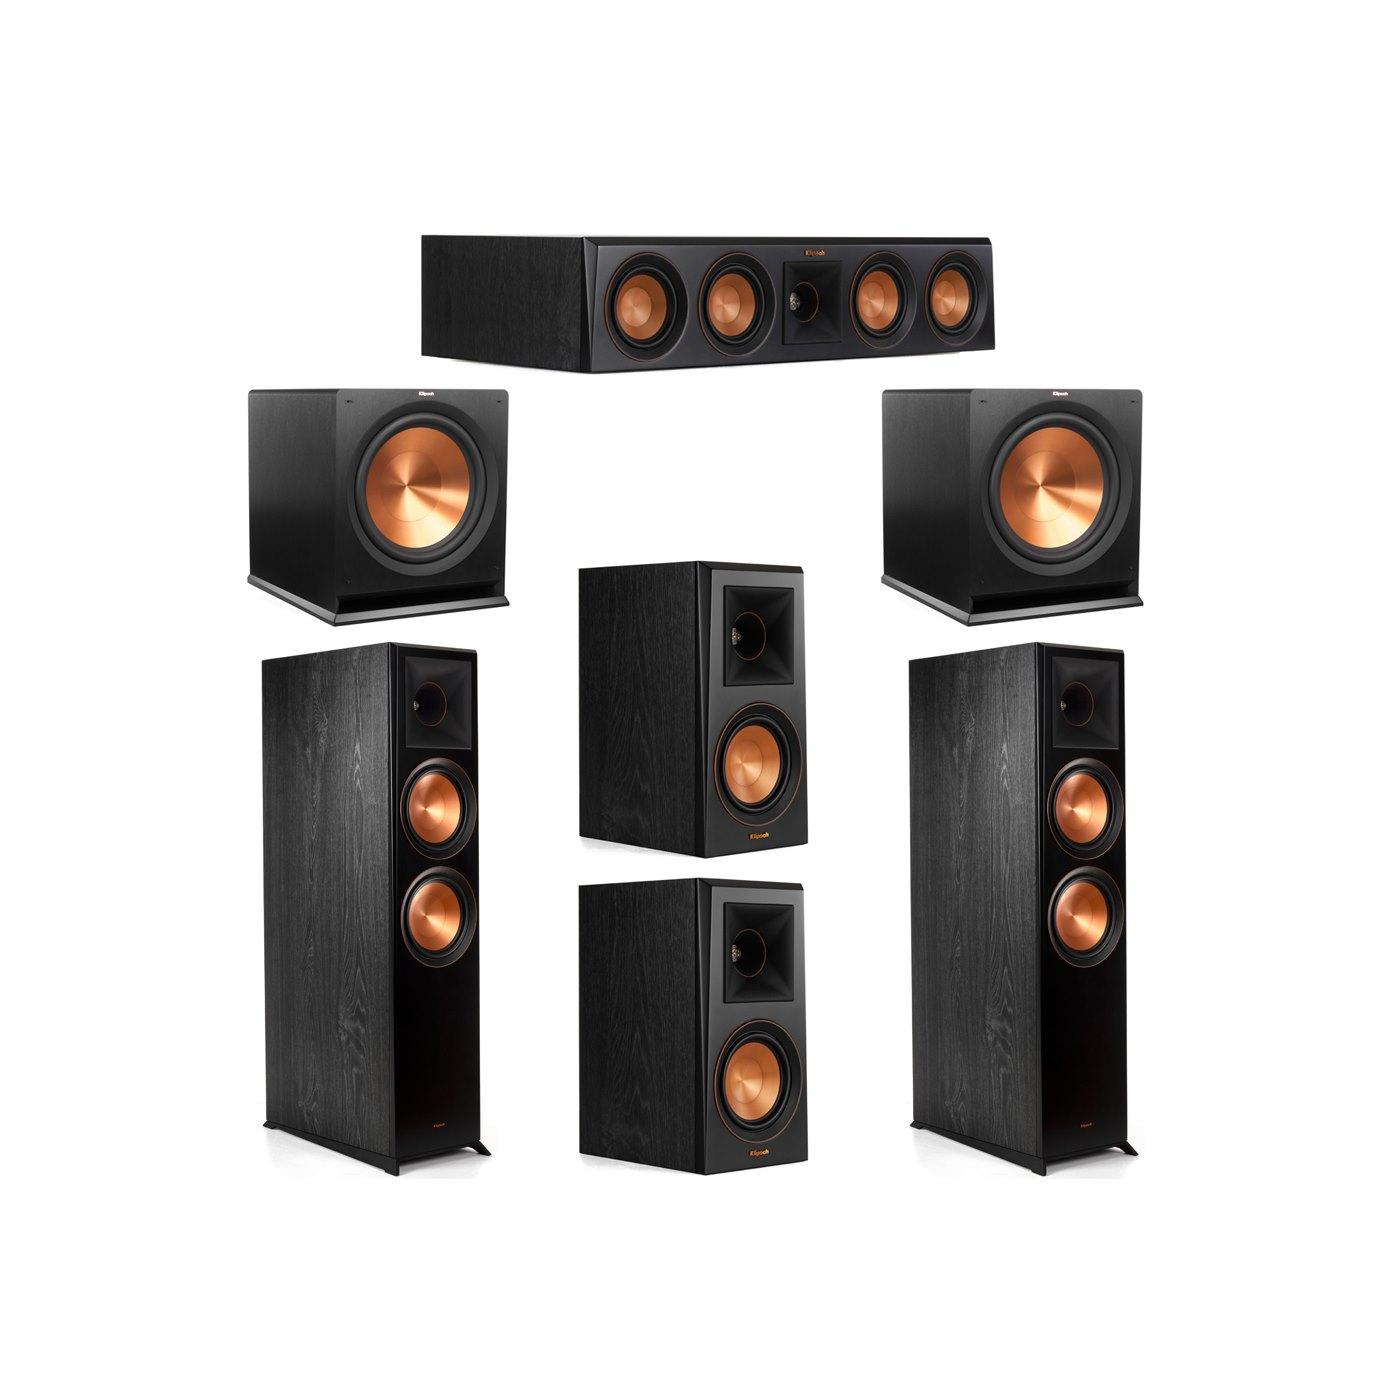 Klipsch 5.2 System with 2 RP-8000F Floorstanding Speakers, 1 Klipsch RP-404C Center Speaker, 2 Klipsch RP-500M Surround Speakers, 2 Klipsch R-115SW Subwoofers